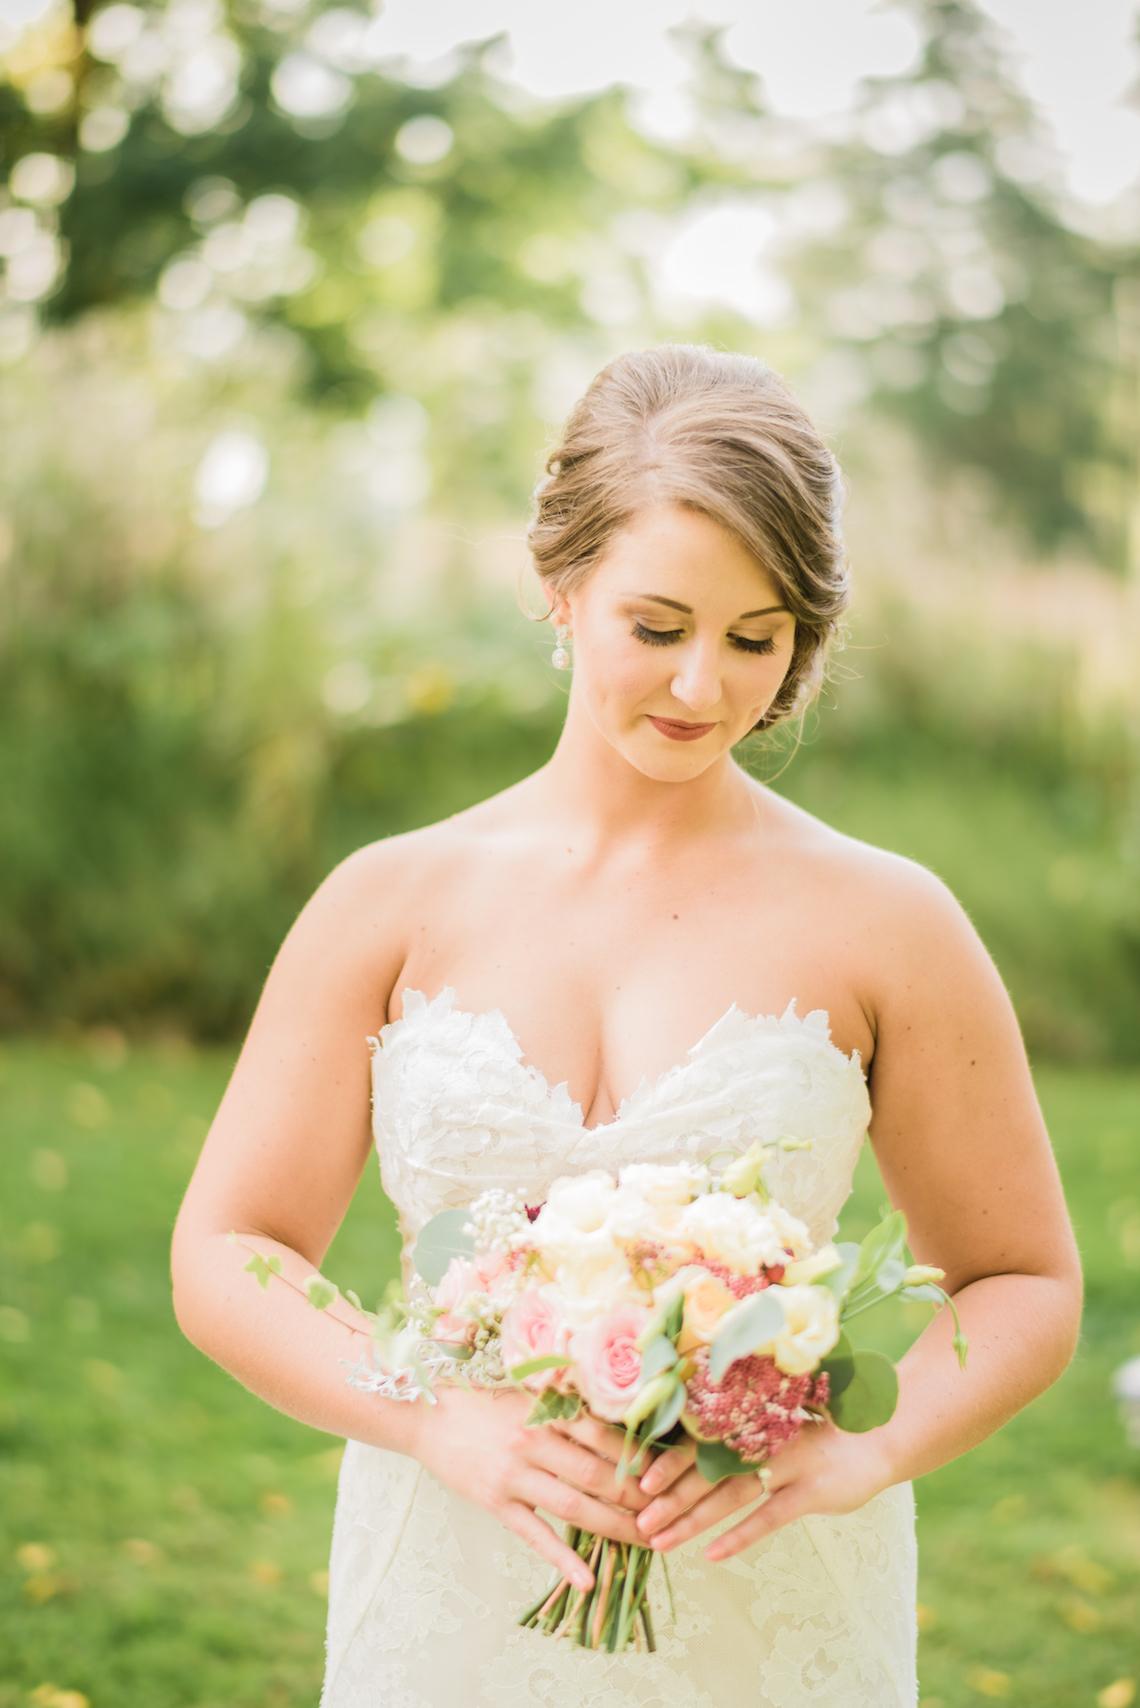 Gorgeous Mermaid Wedding Dress - A Philander Chase Knox Estate Pennsylvania Wedding